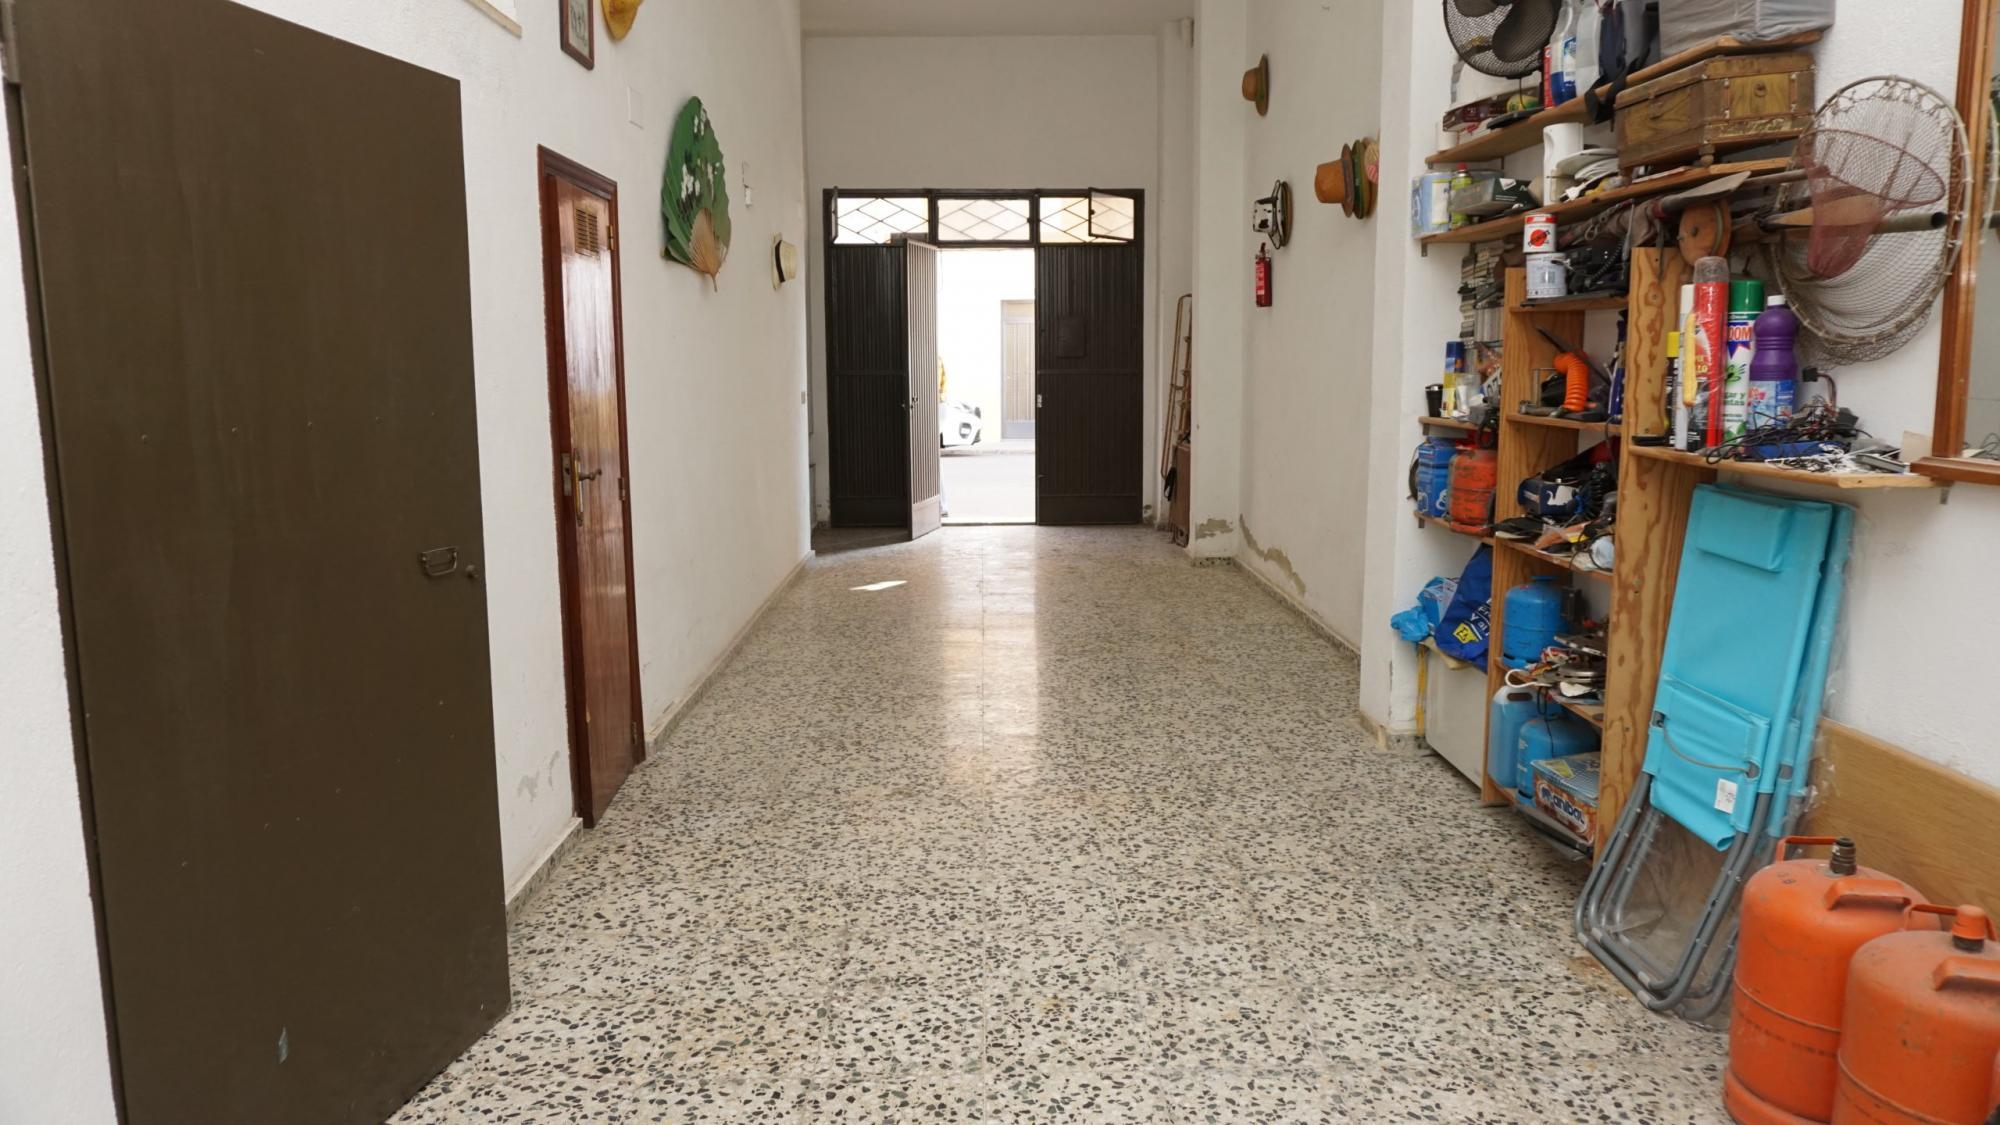 Casa en Venta en Burriana (Castellón) zona Ctra. Nules